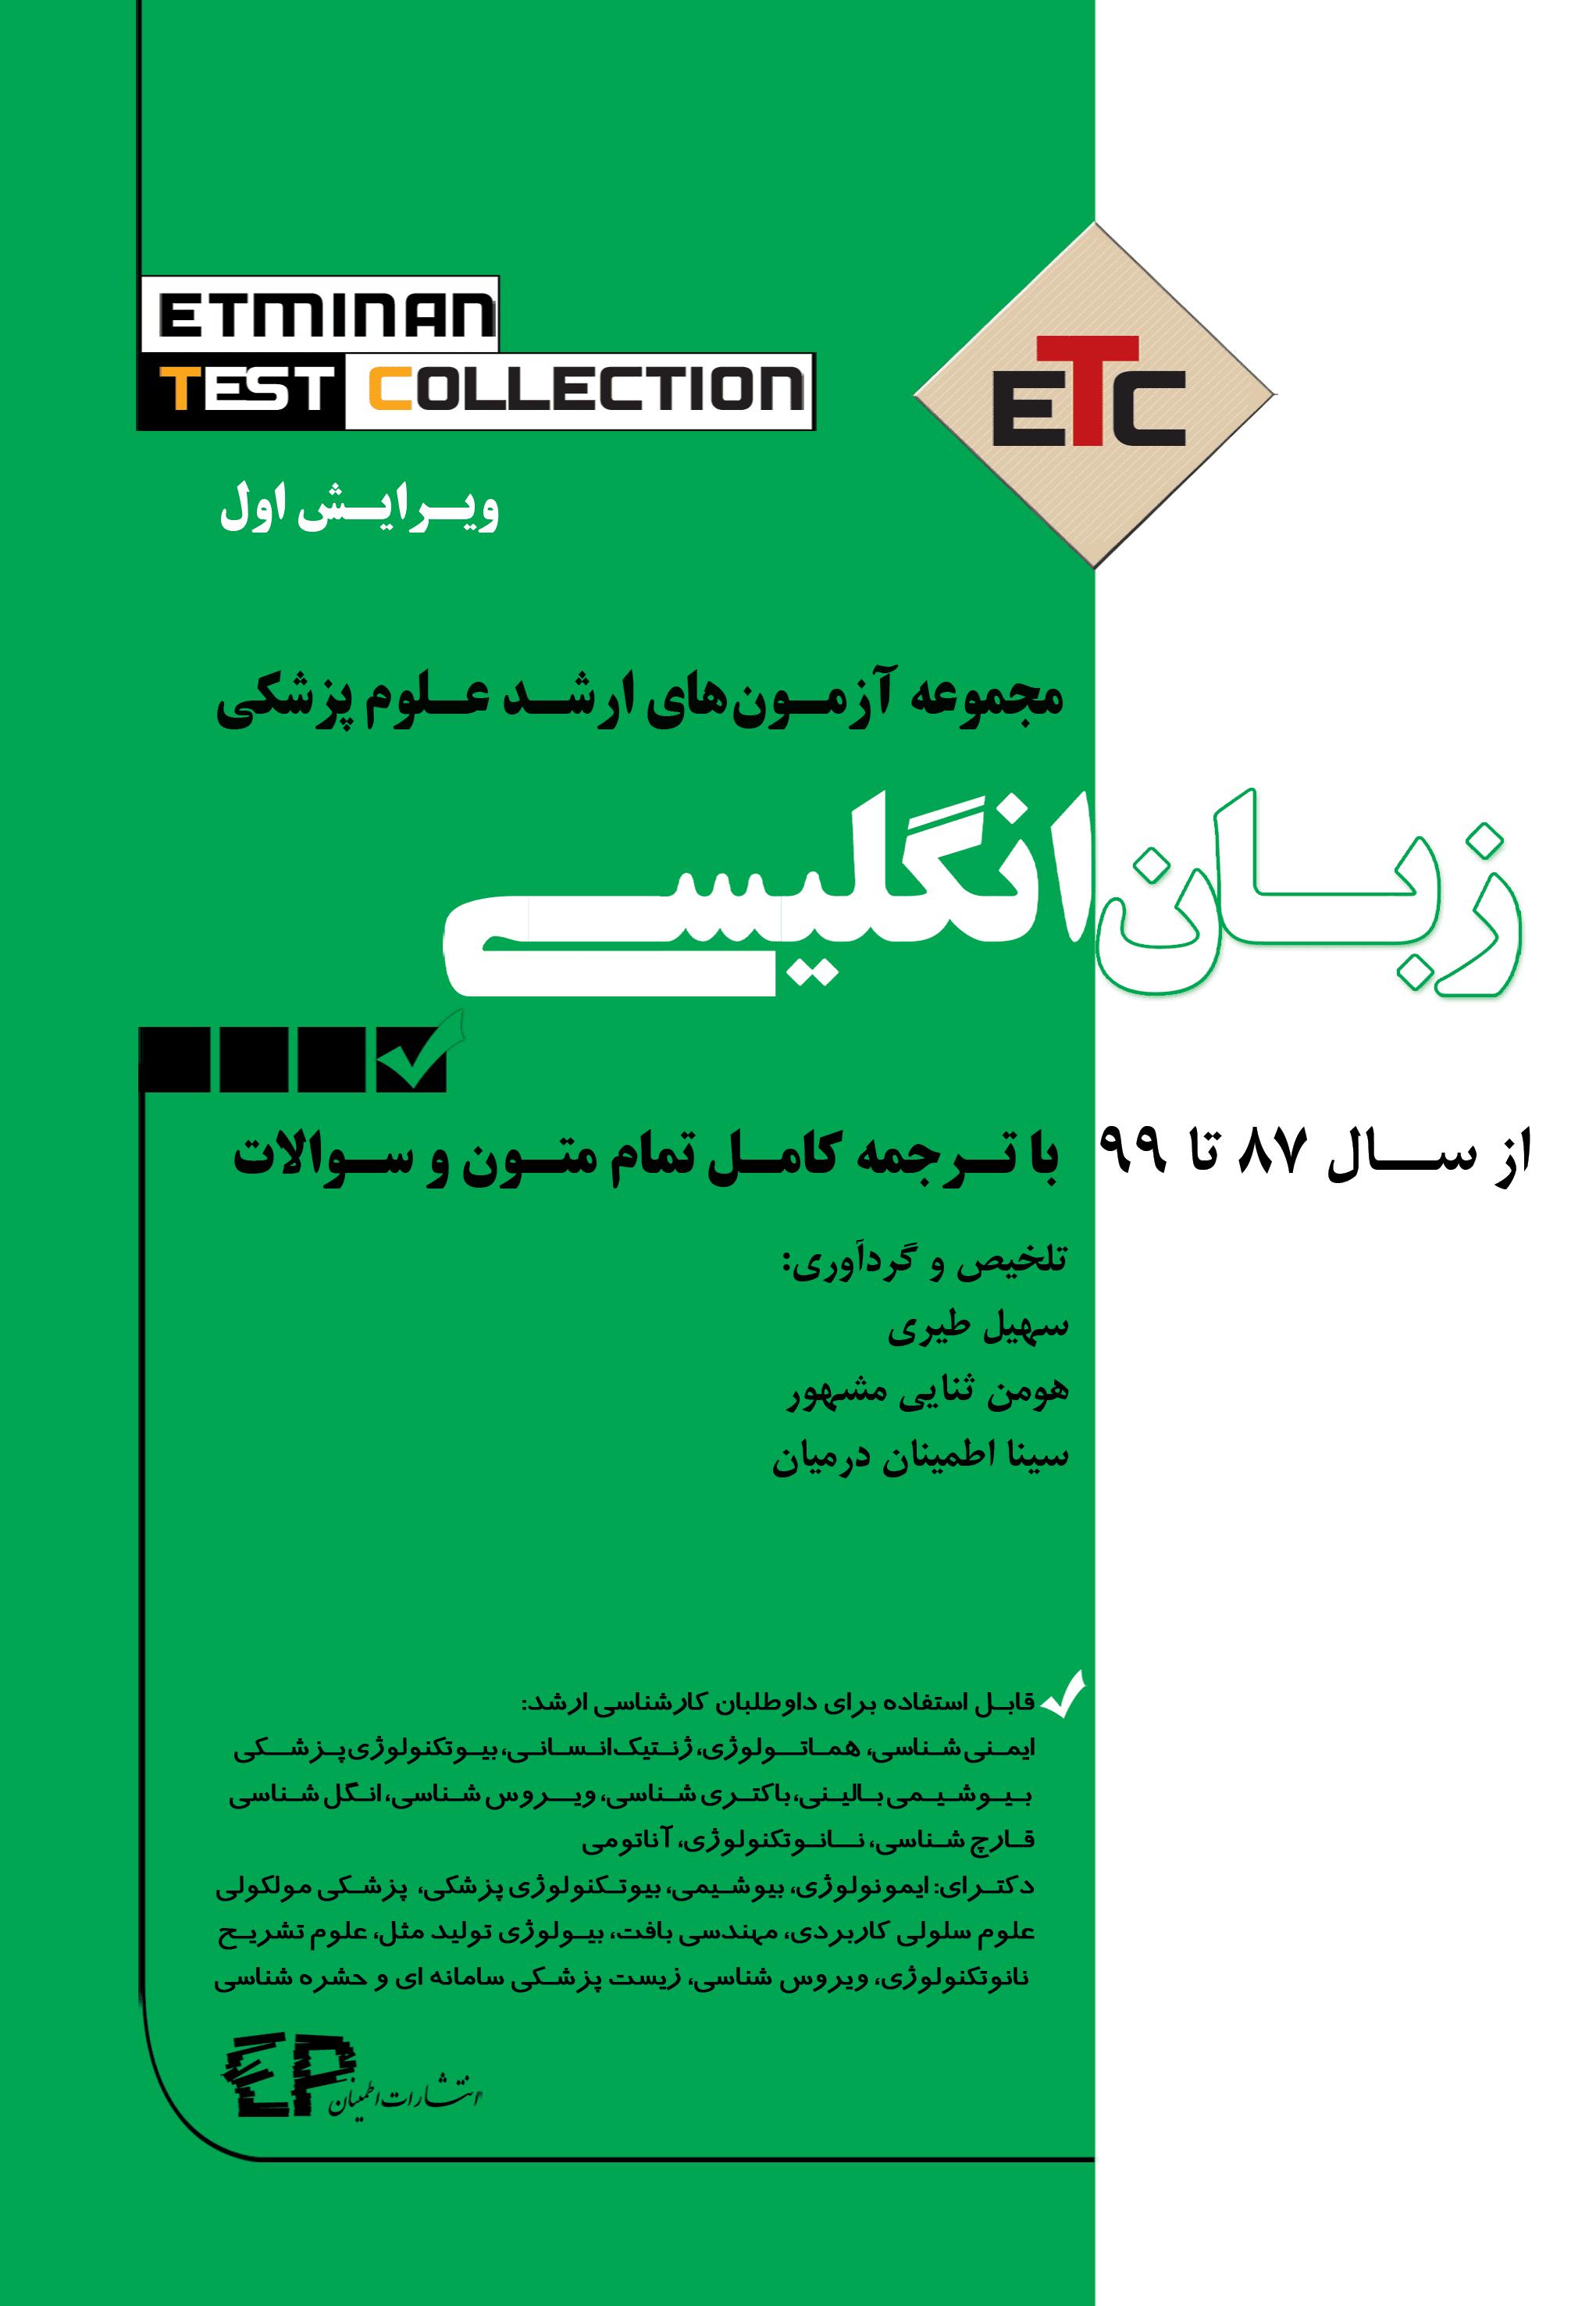 ETC  –  مجموعه آزمون های ارشد علوم پزشکی زبان انگلیسی ( ۸۷ تا ۹۹ )